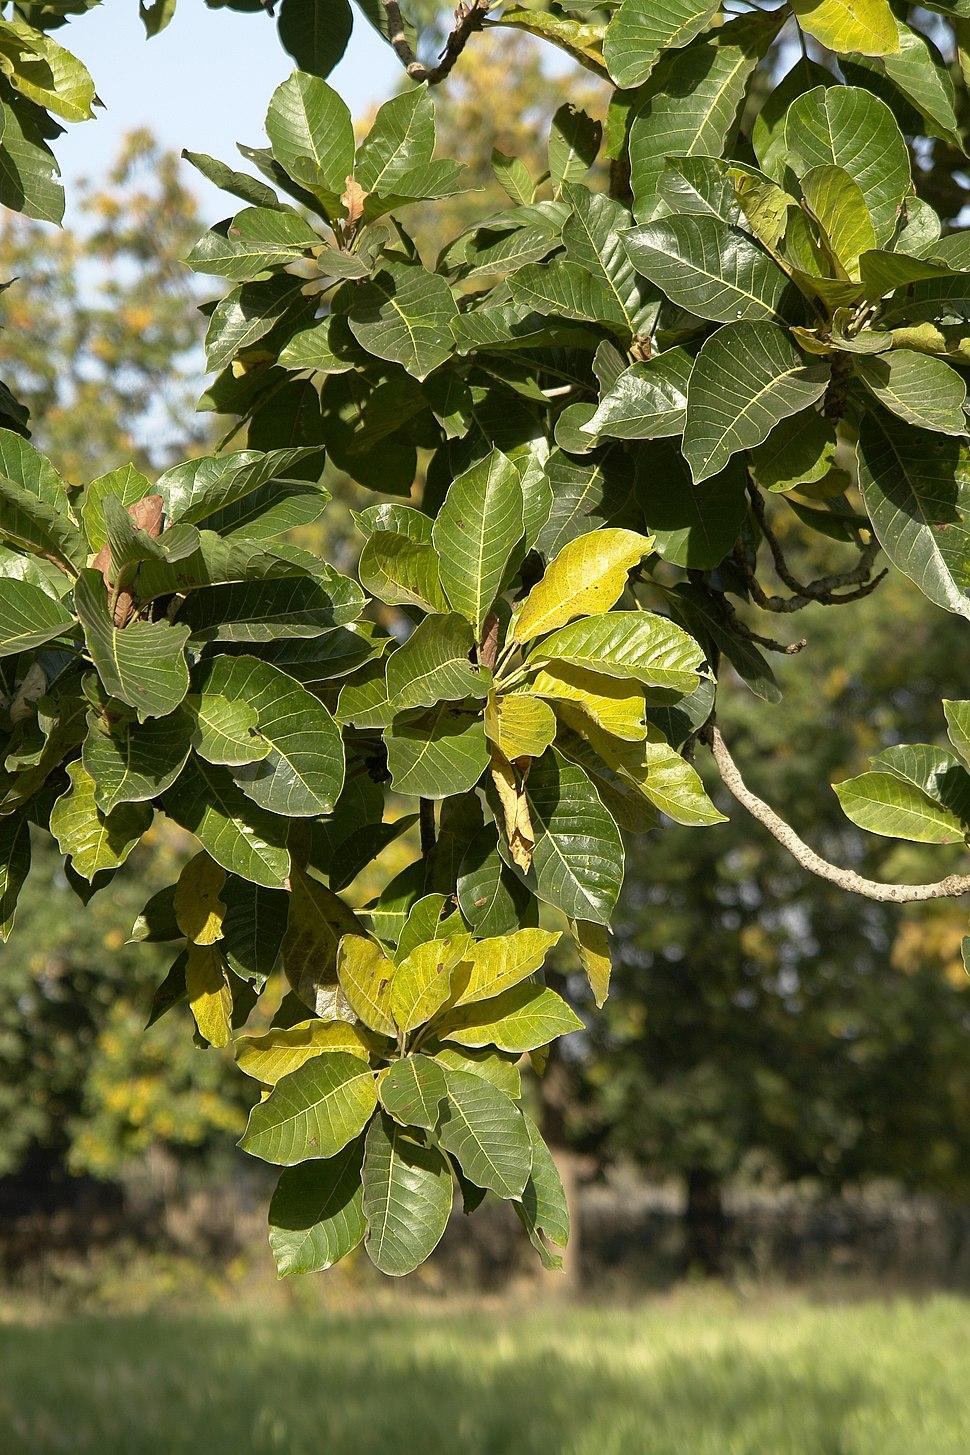 Leaves of Madhuca longifolia, Umaria district, MP, India